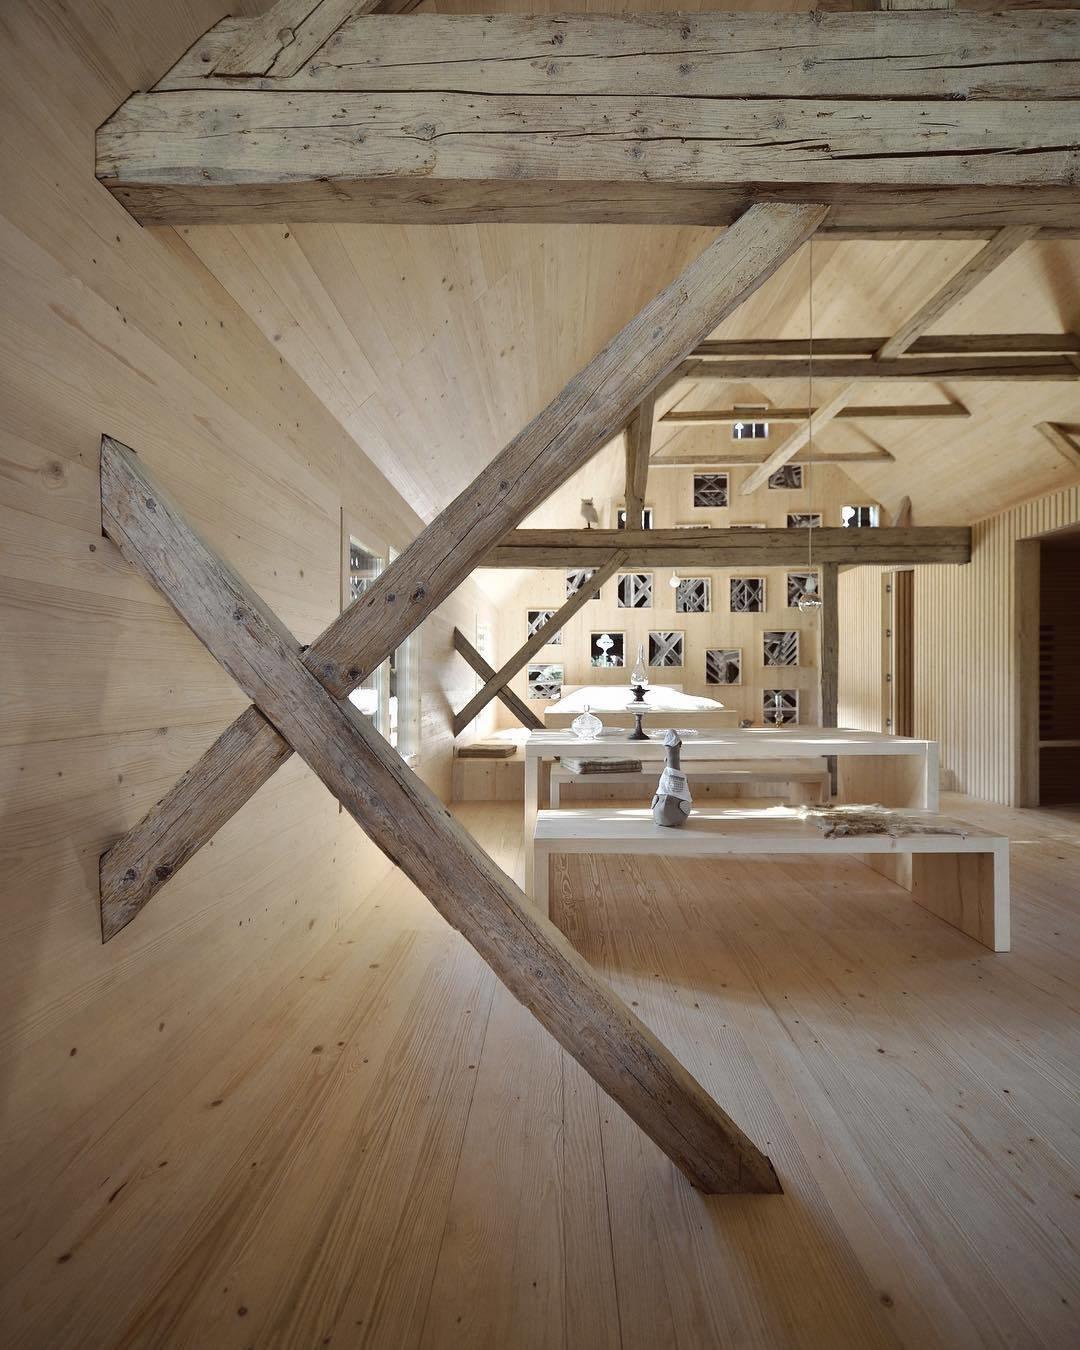 Alpine Barn apartment in Bohinj, Slovenia. (Courtesy of OFIS)